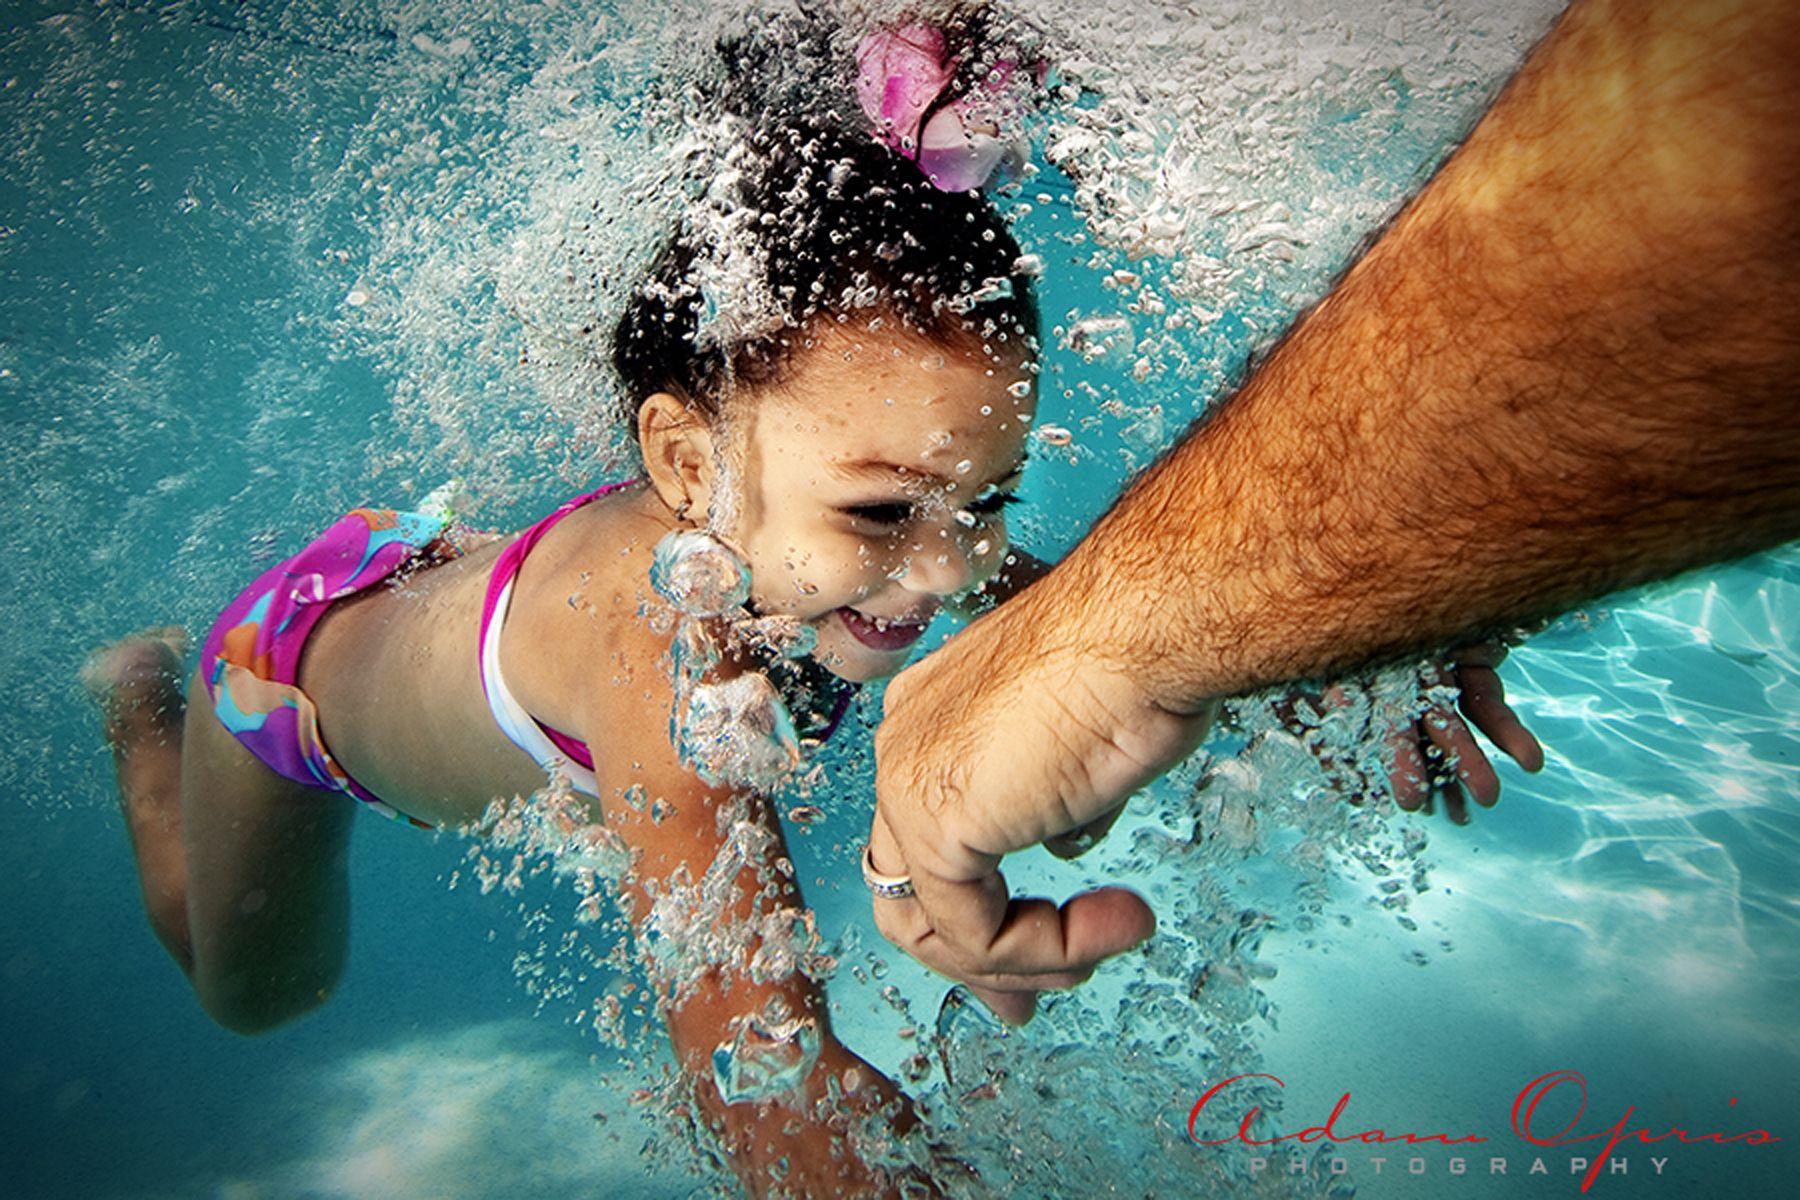 Underwater Kids Photography Adam Opris Photography www.adamoprisphoto.com